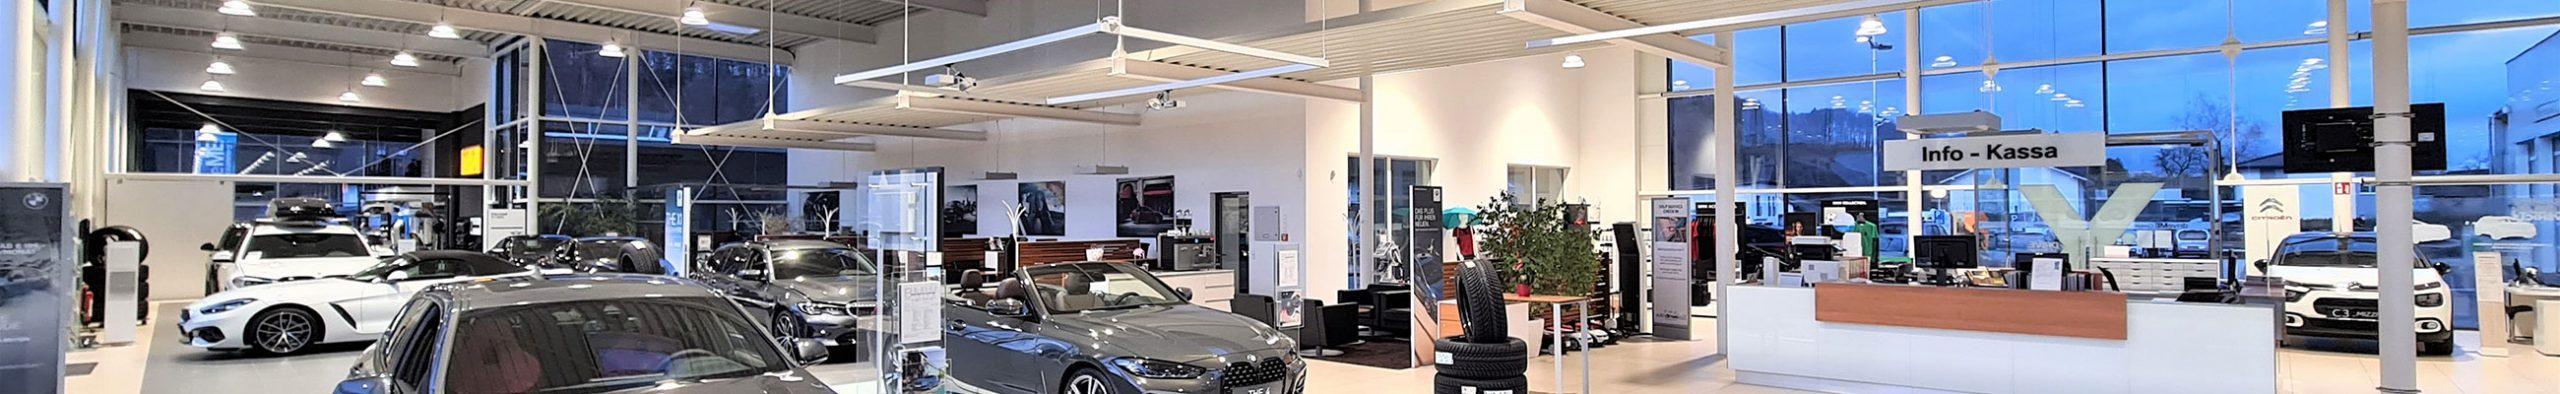 DriveMe Autohaus Salzkammergut